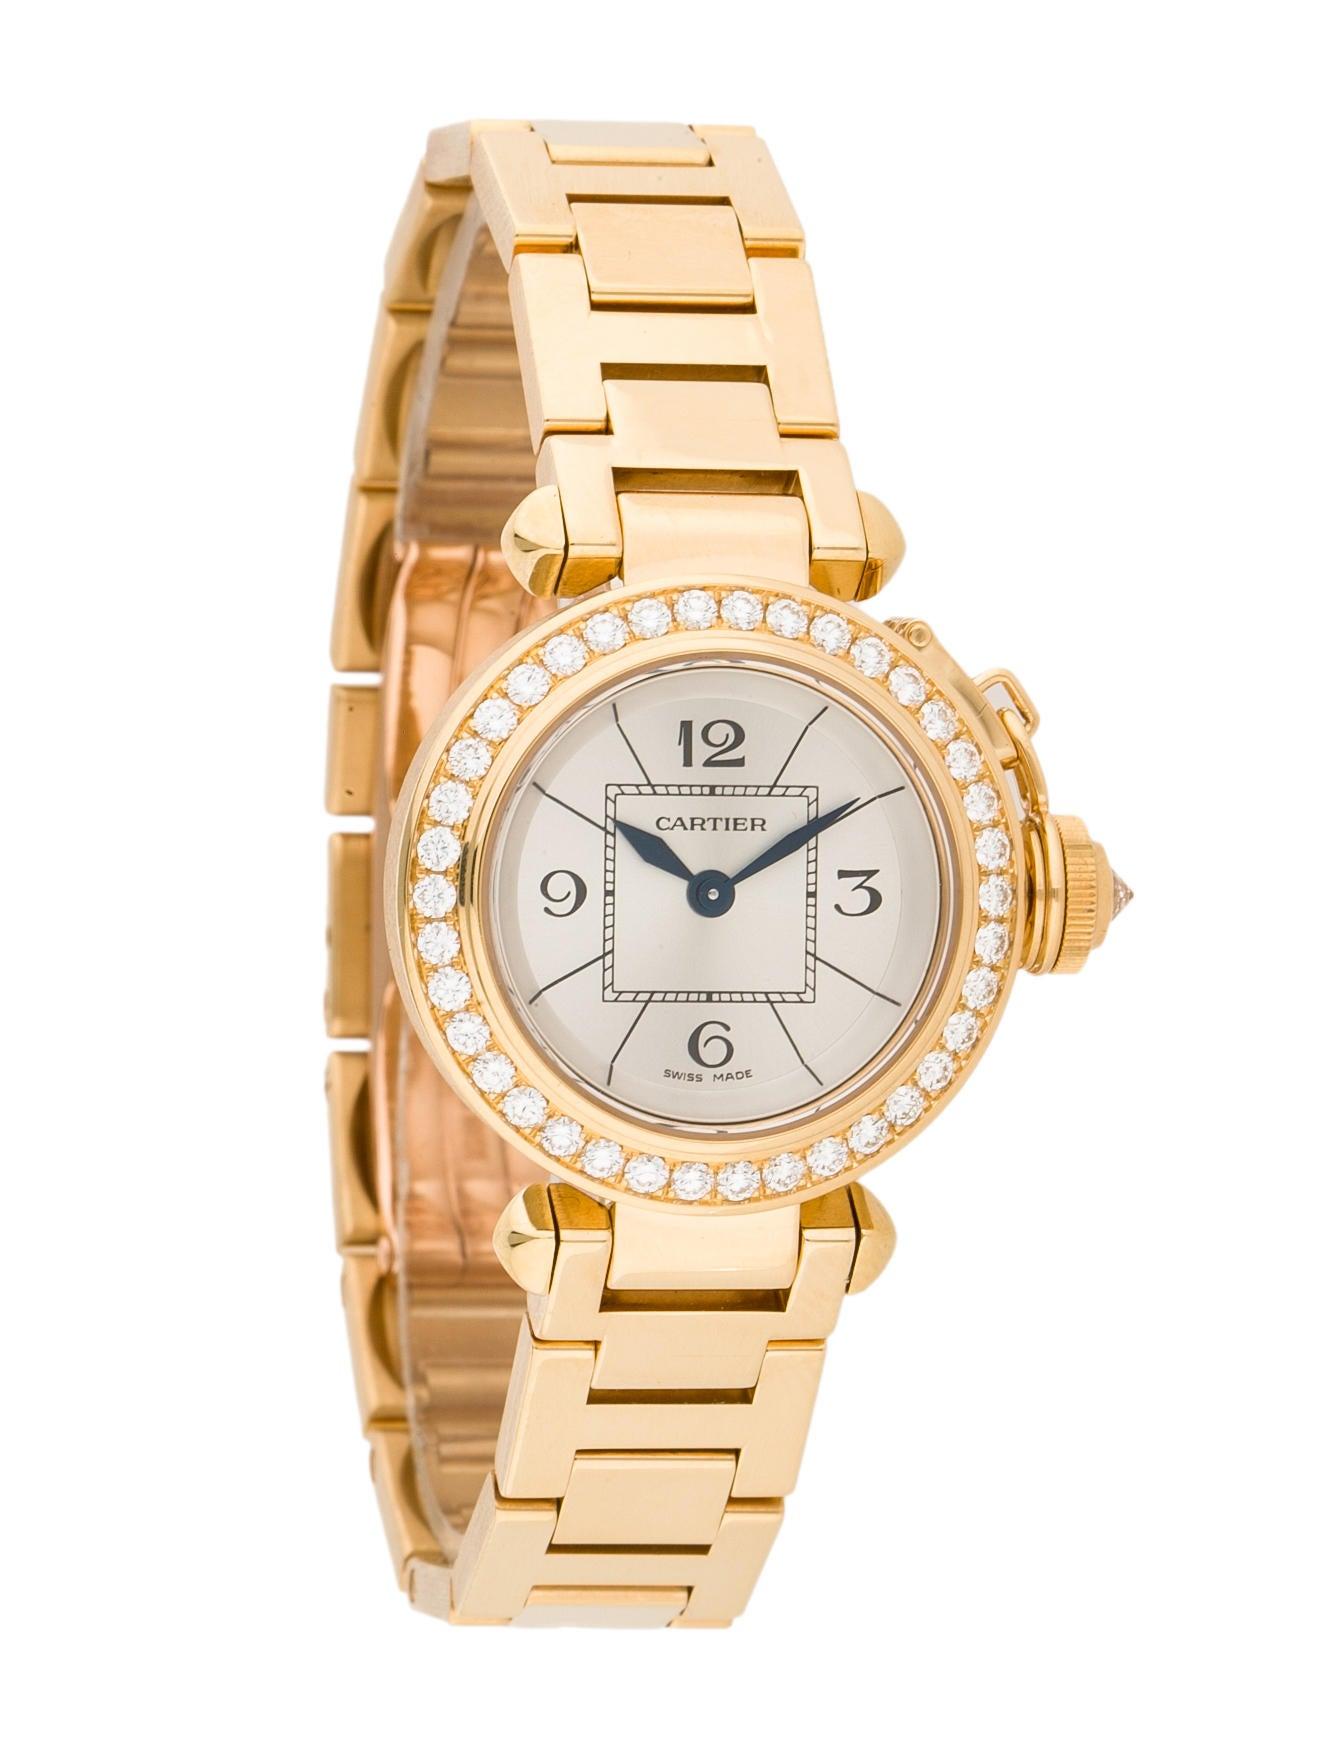 Cartier Gold Pasha Watch Cartier Miss Pasha Watch